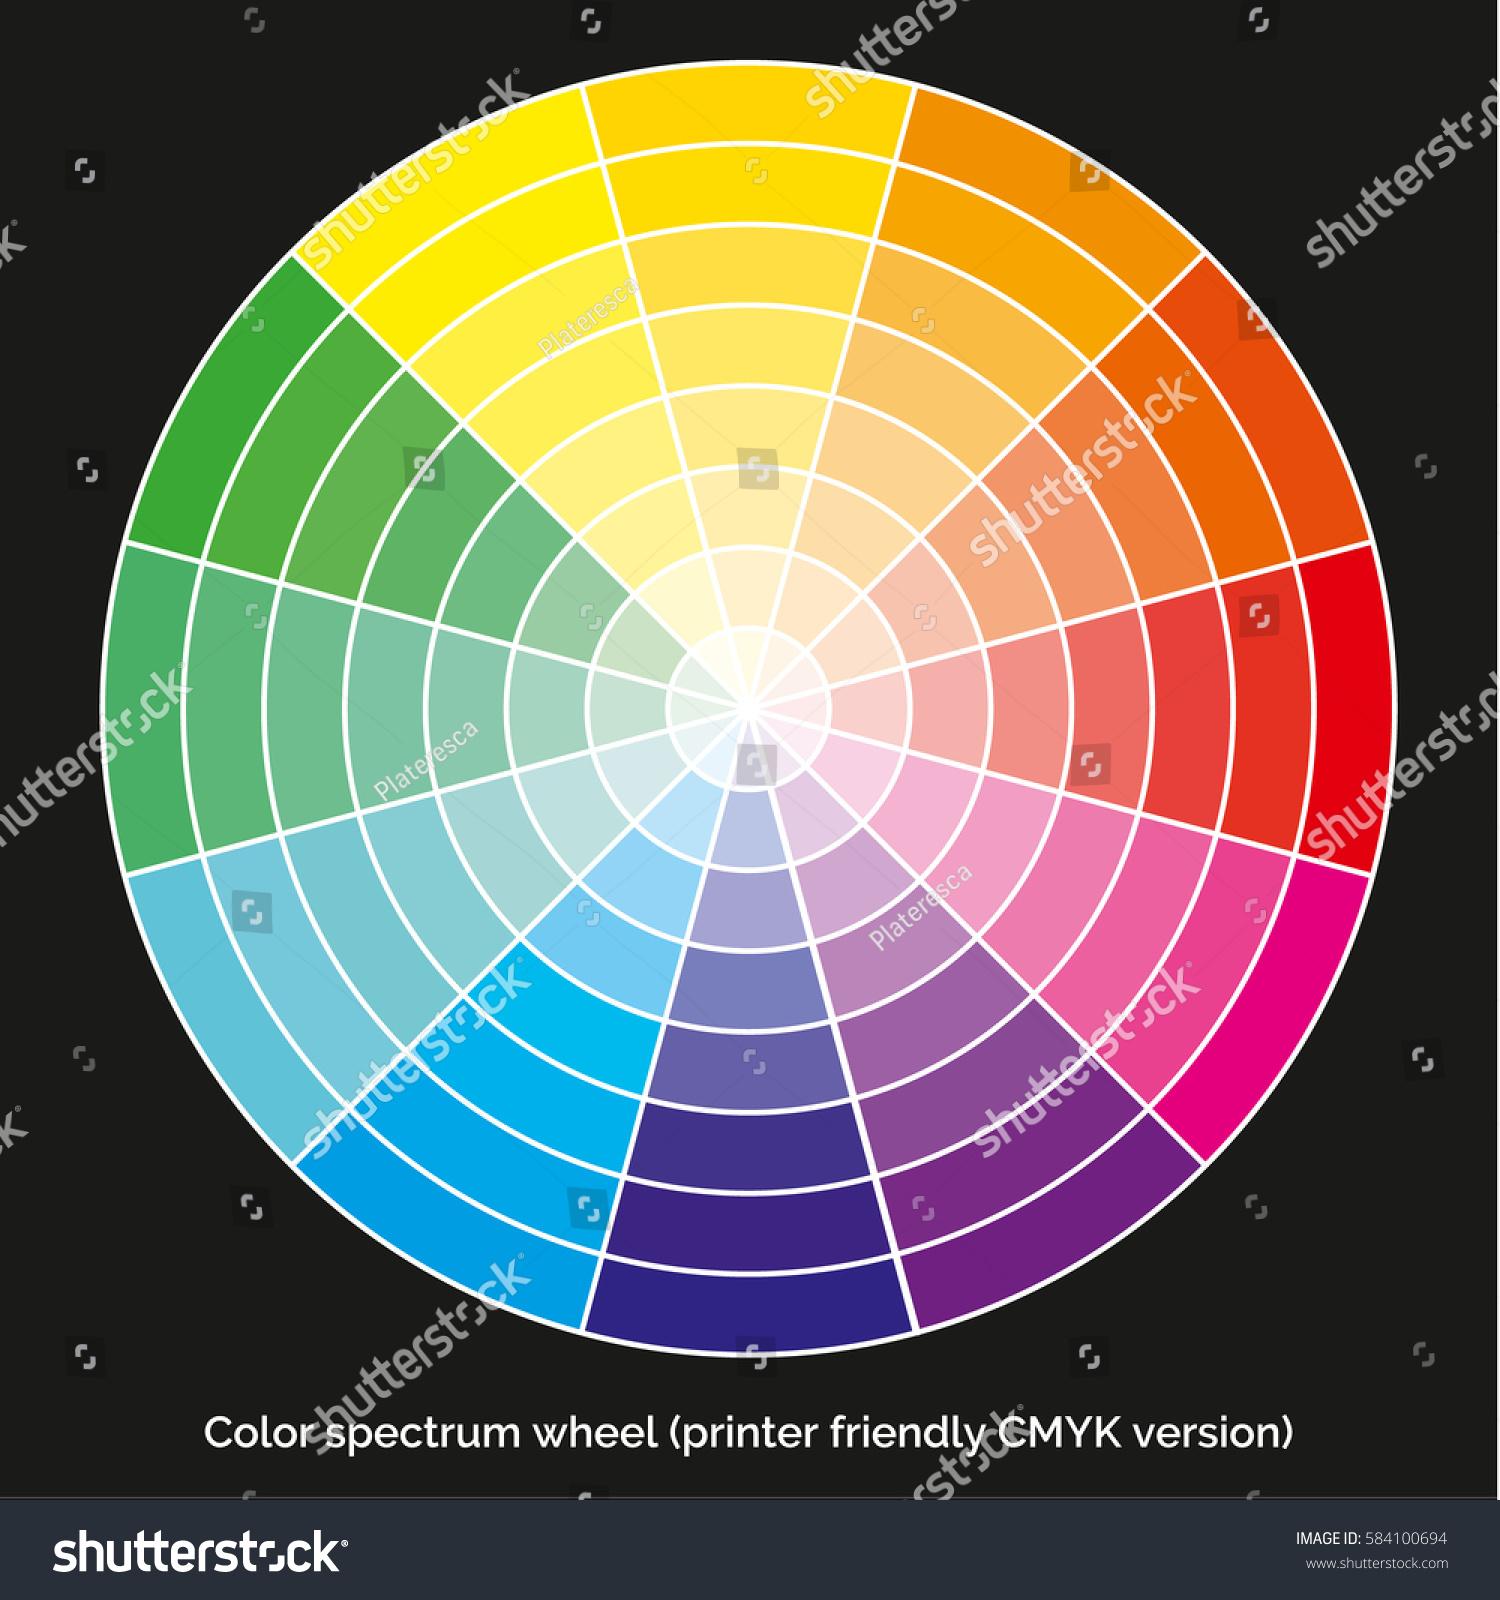 Vector Color Spectrum Itten 12 Color Wheel Stock Vector Royalty